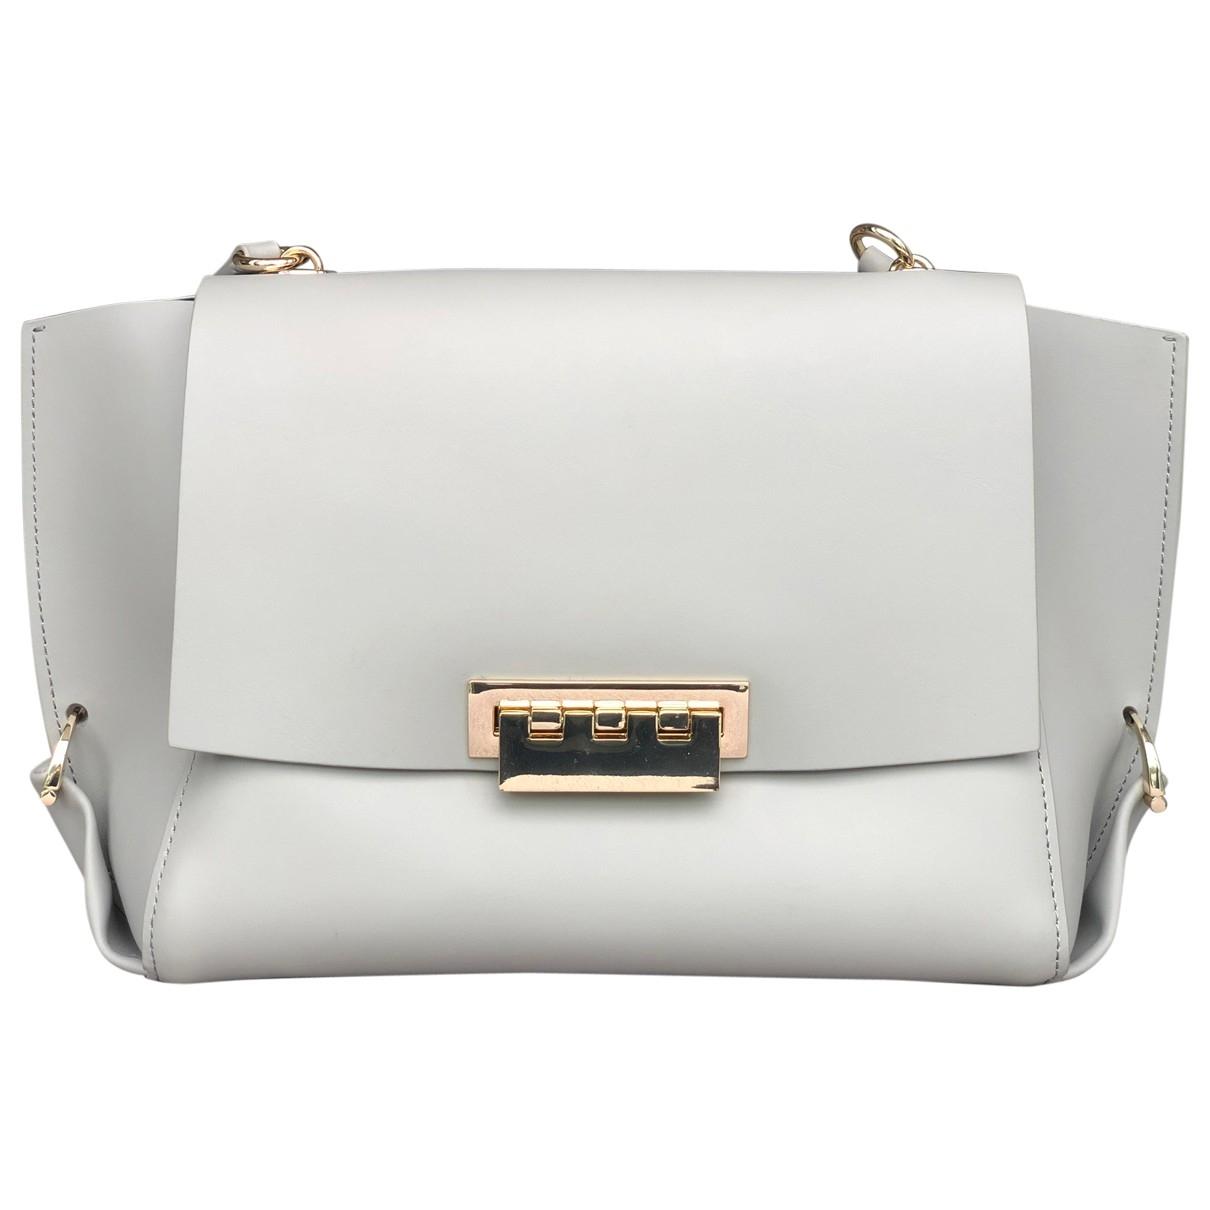 Zac Posen \N Grey Leather handbag for Women \N